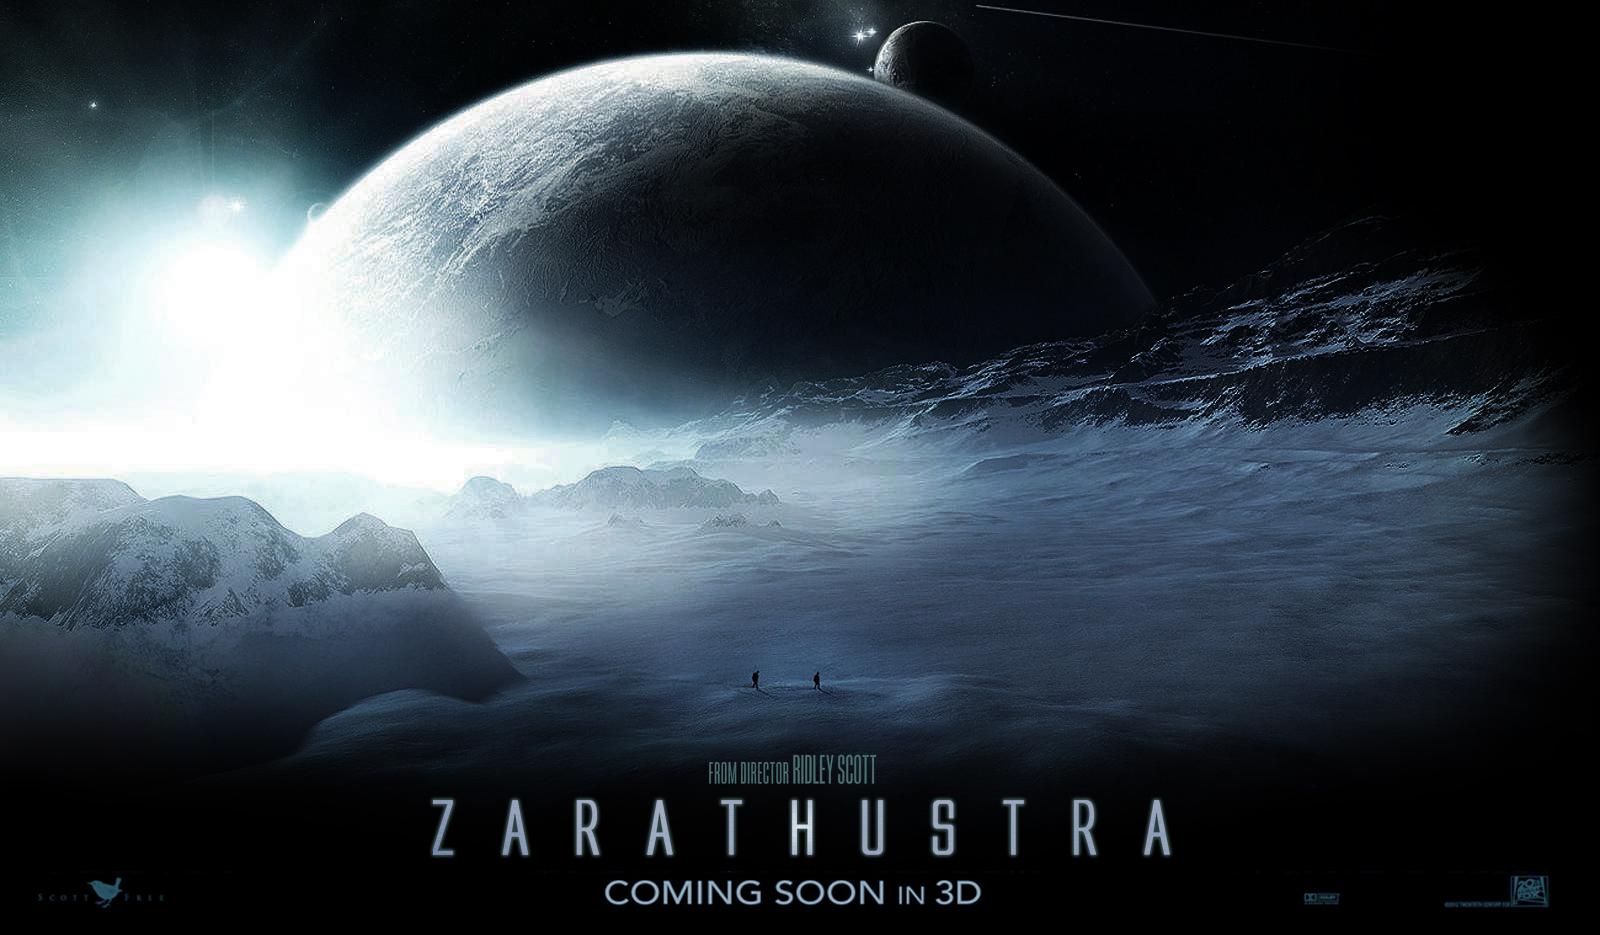 Prometheus 2 teaser - ZARATHUSTRA